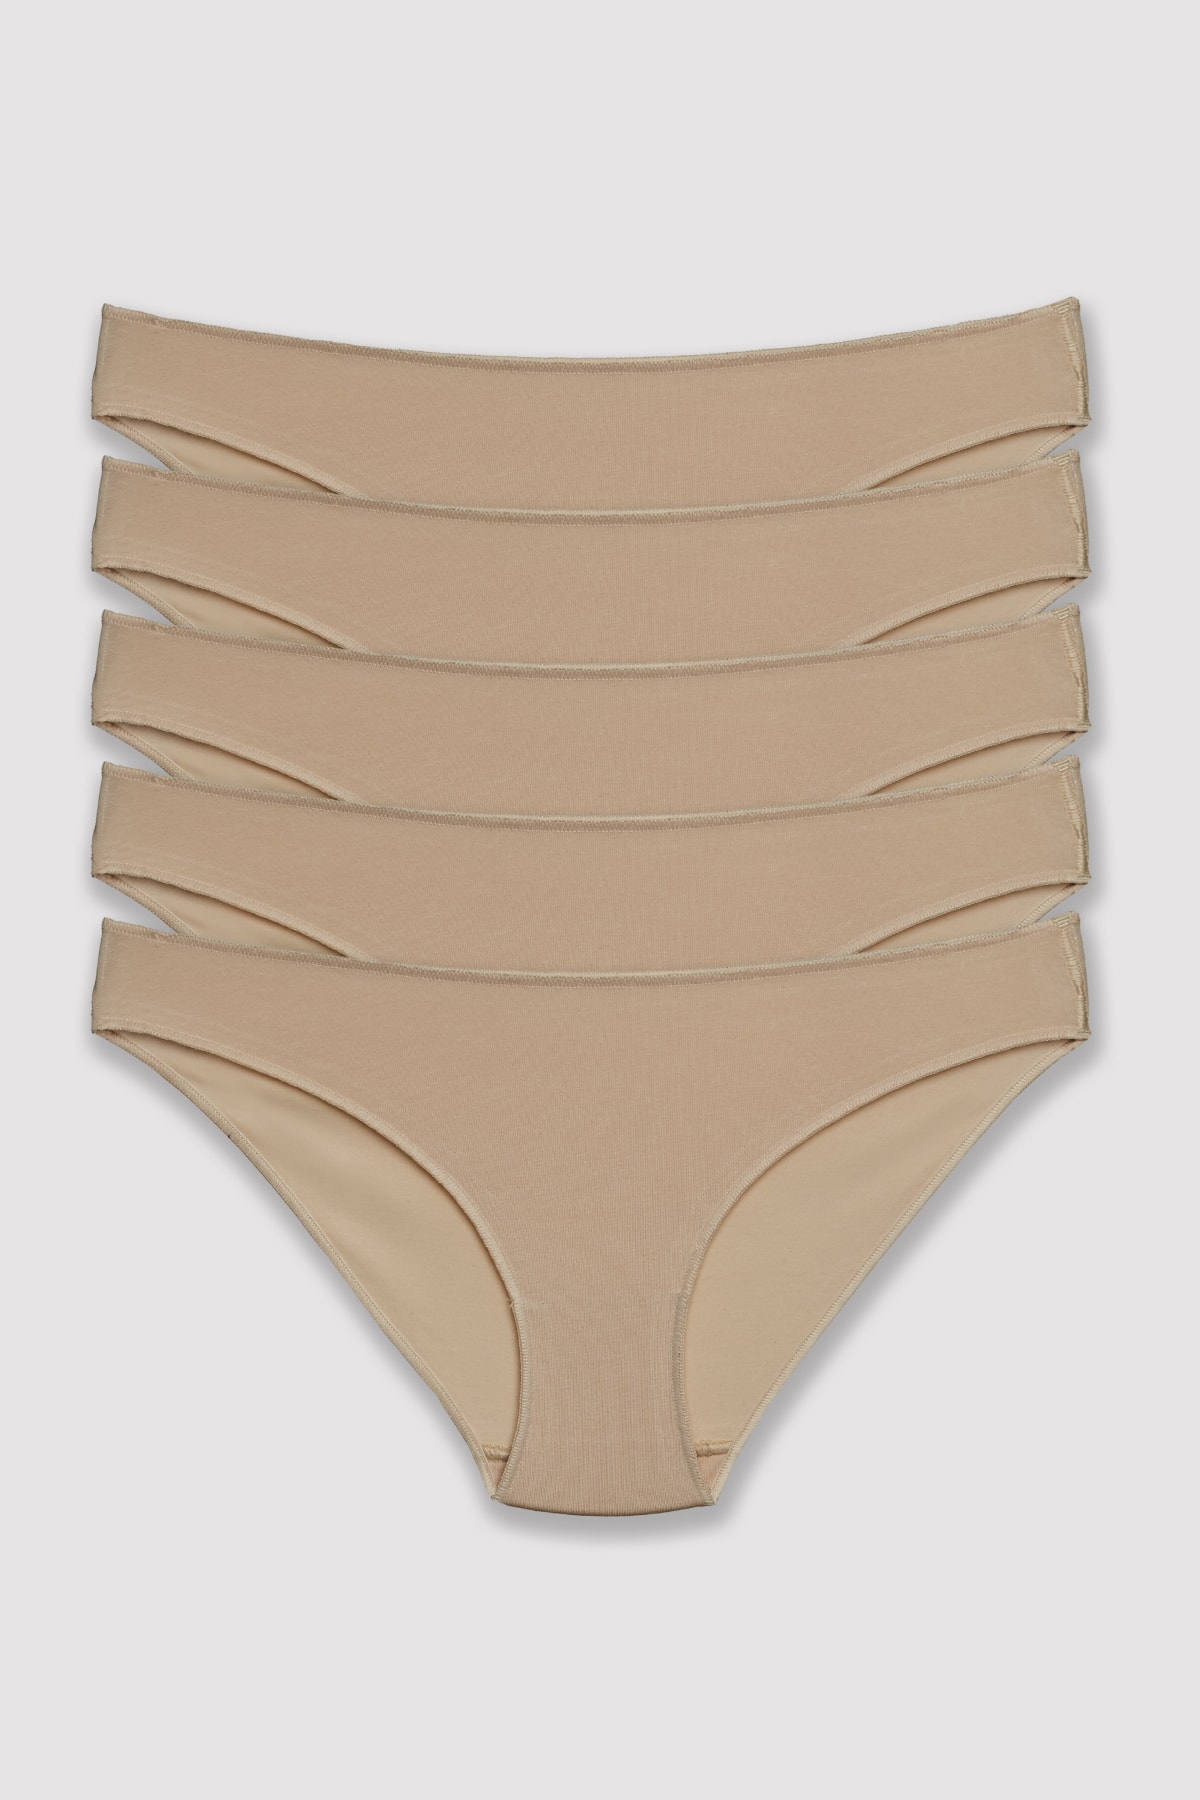 Pierre Cardin Kadın Ten 2050 Noshow Bikini 5li Paket Külot